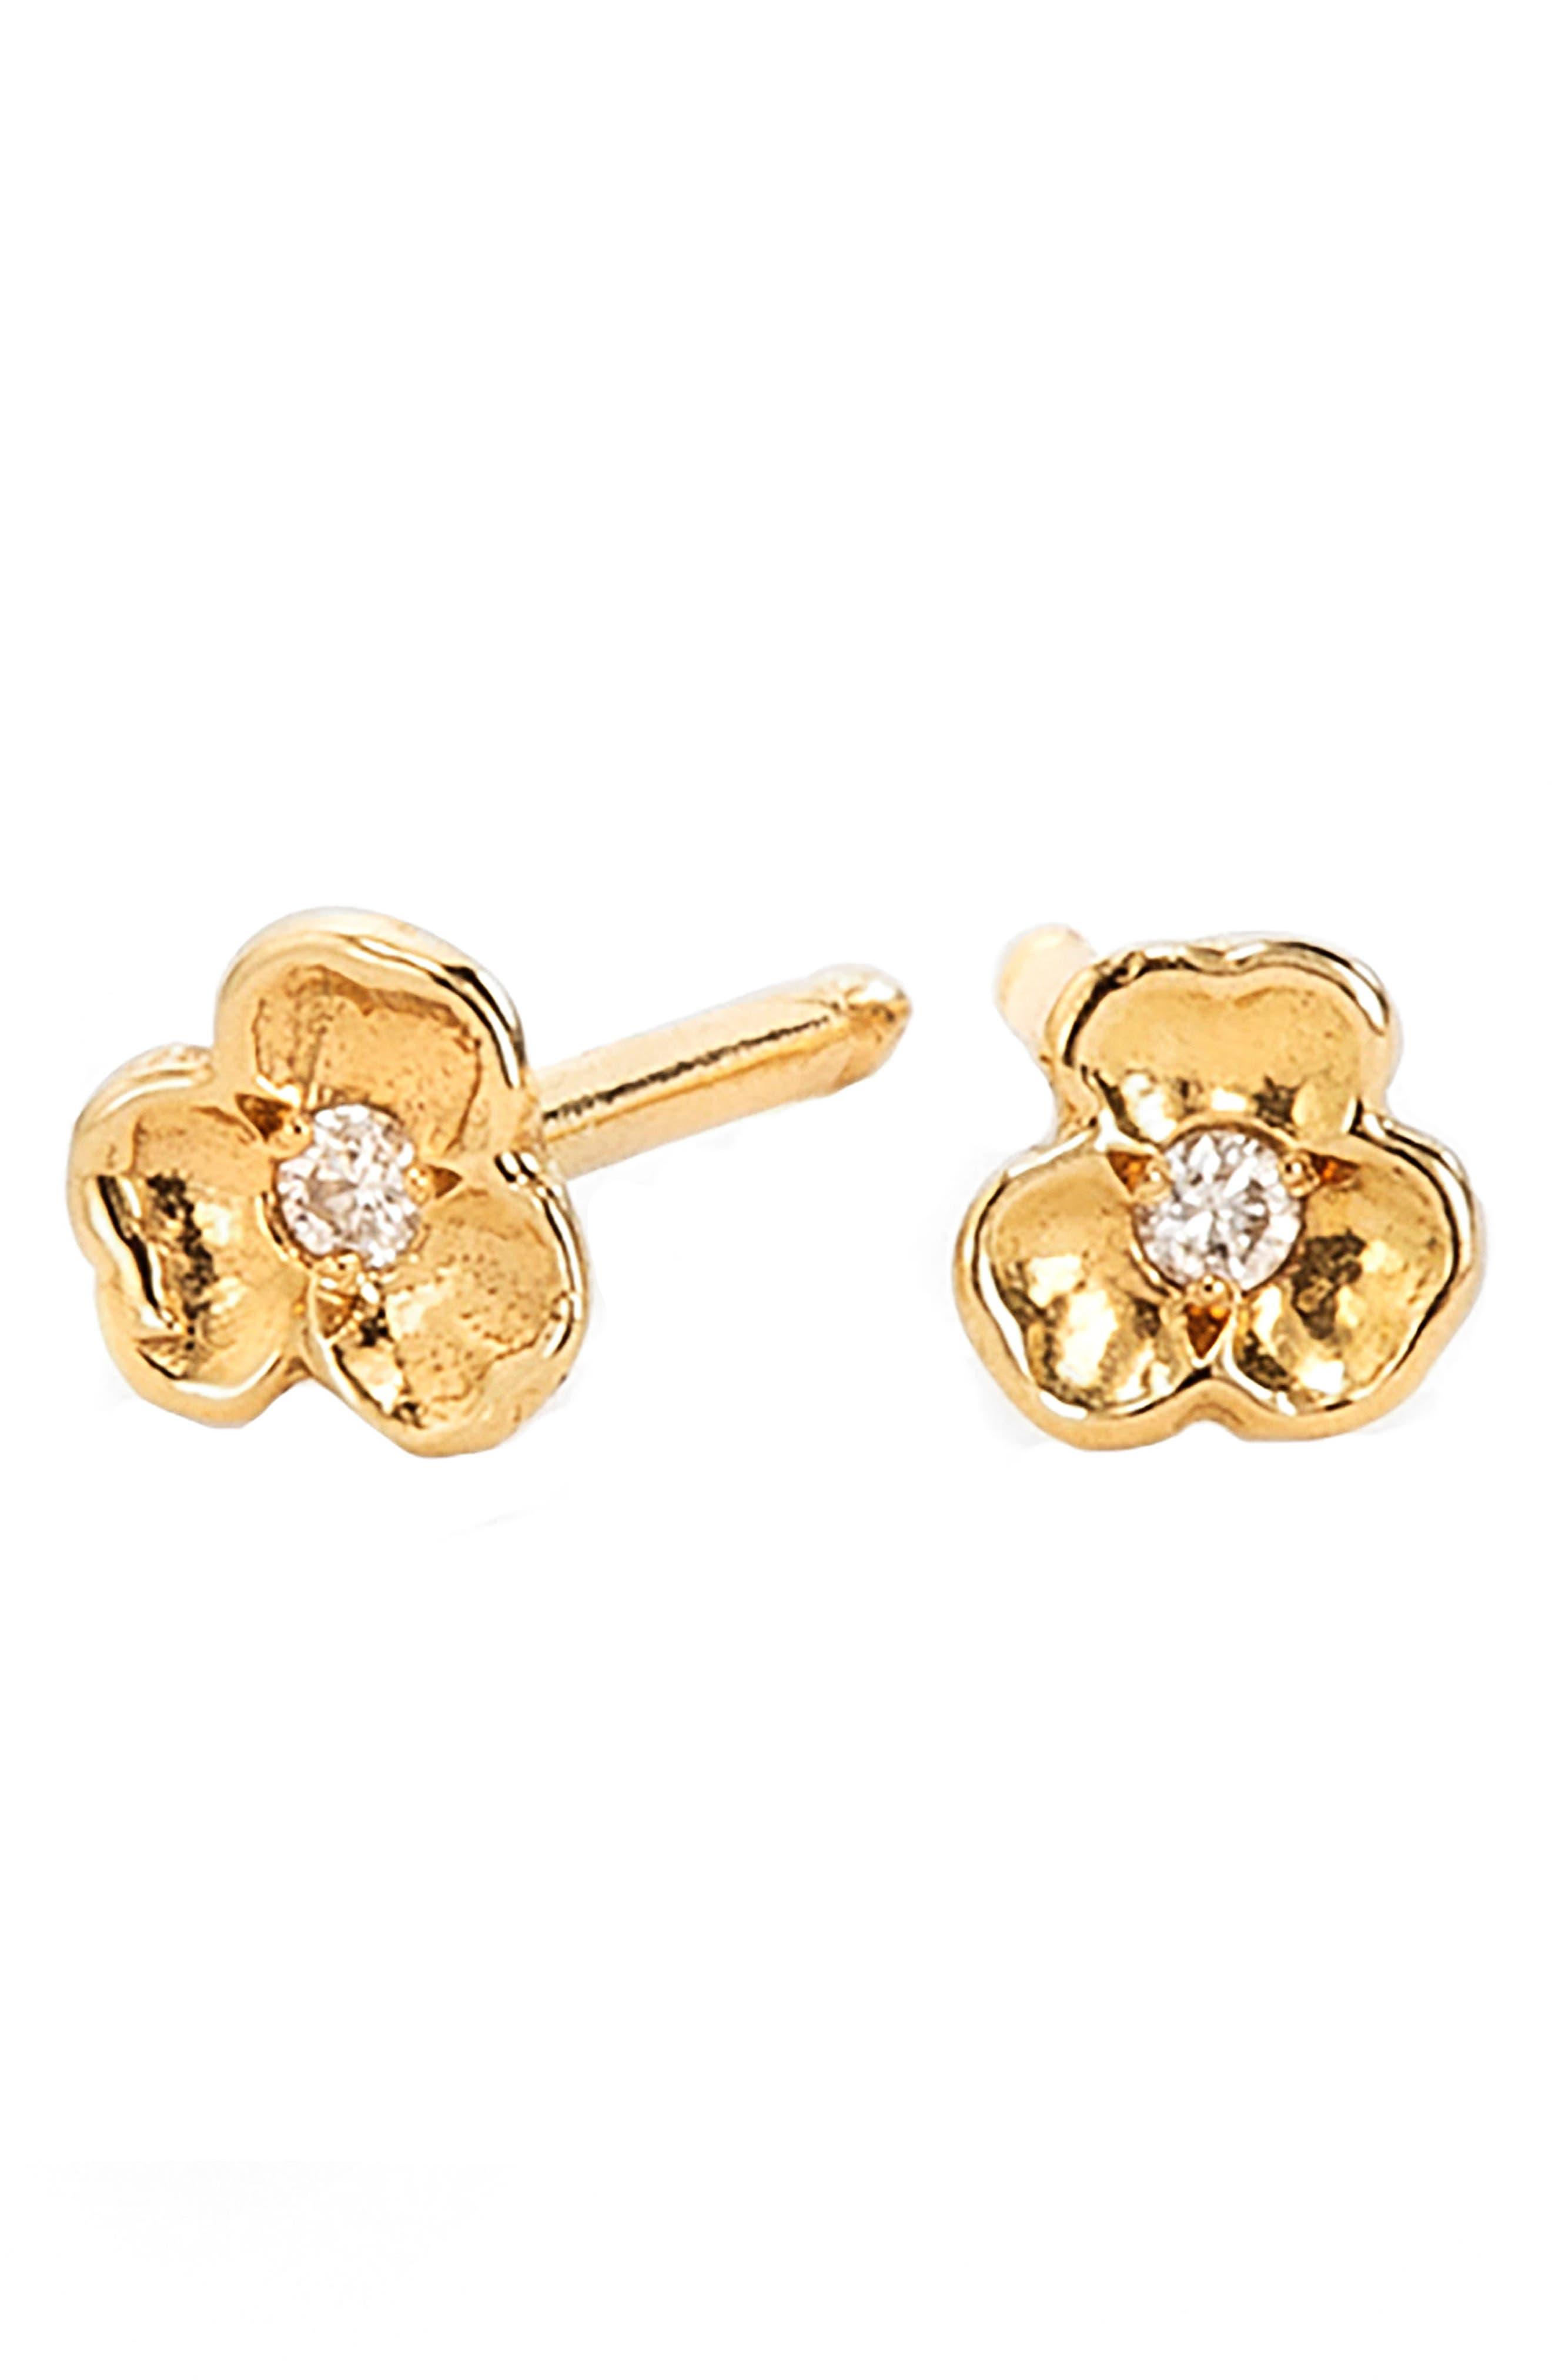 NORA KOGAN TINY DIAMOND PANSY FLOWER STUD EARRINGS